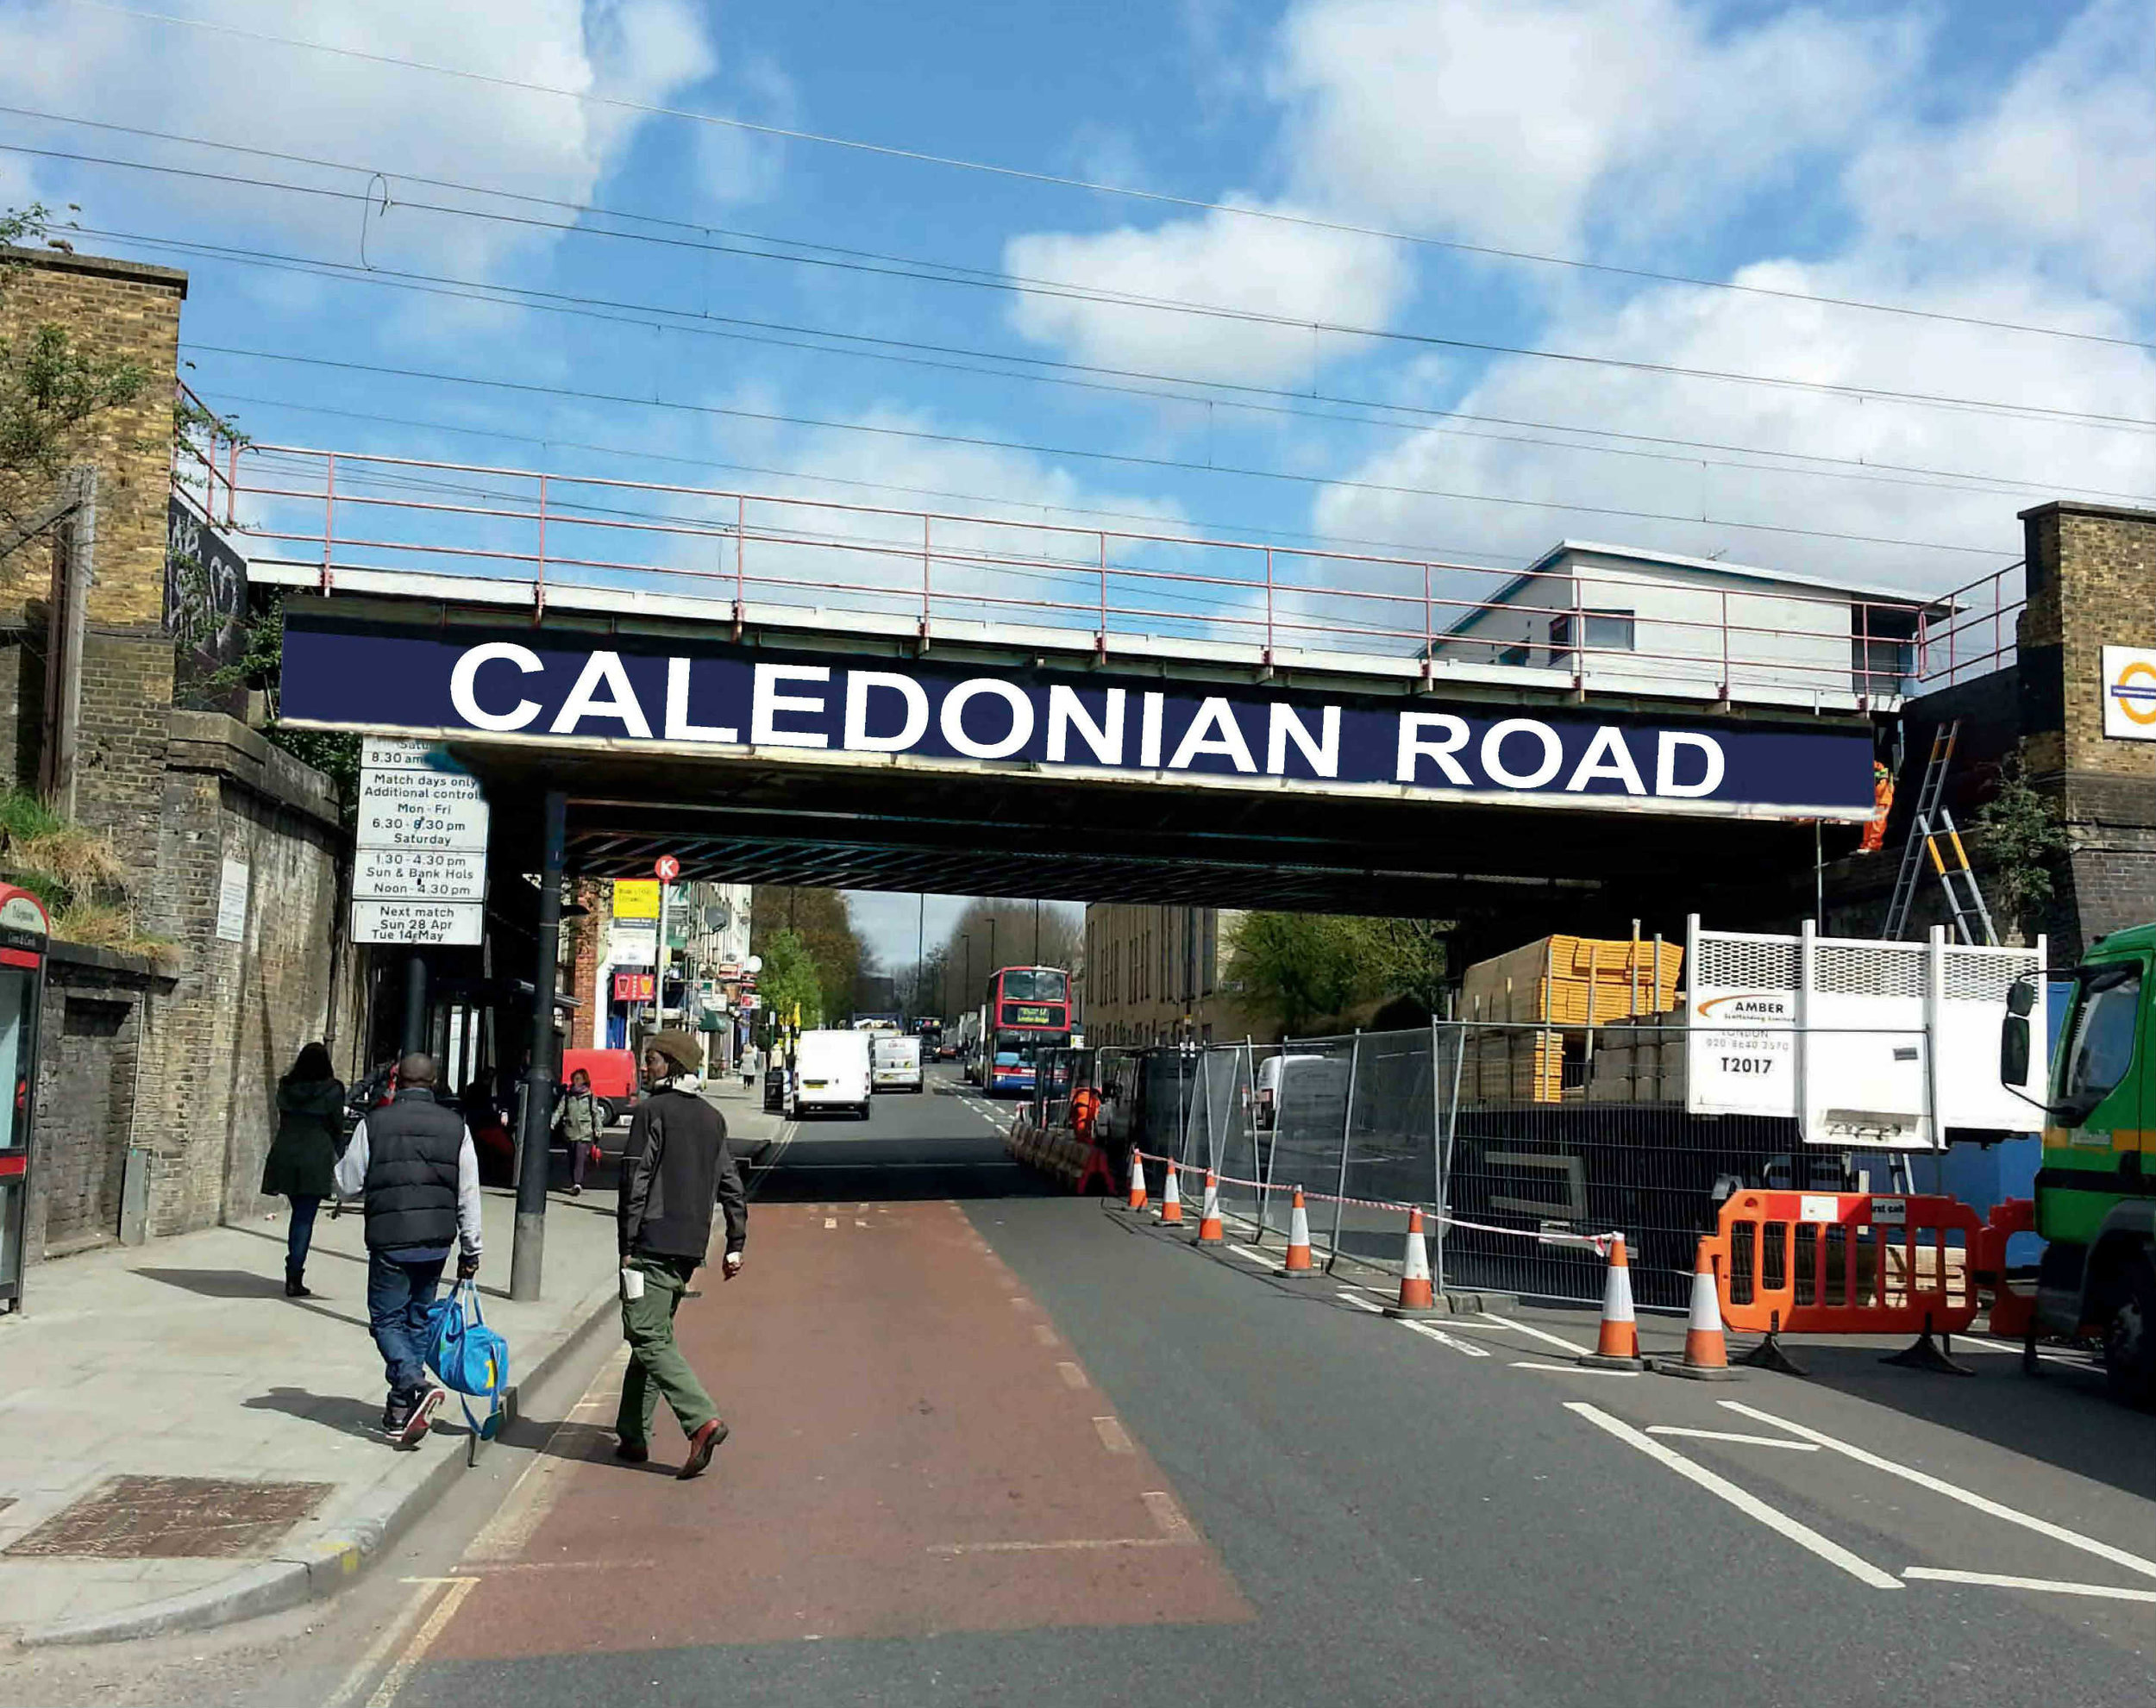 https://callylabourcouncillors.org.uk/2013/05/14/help-choose-a-simple-new-legend-for-the-cally-road-railway-bridge/